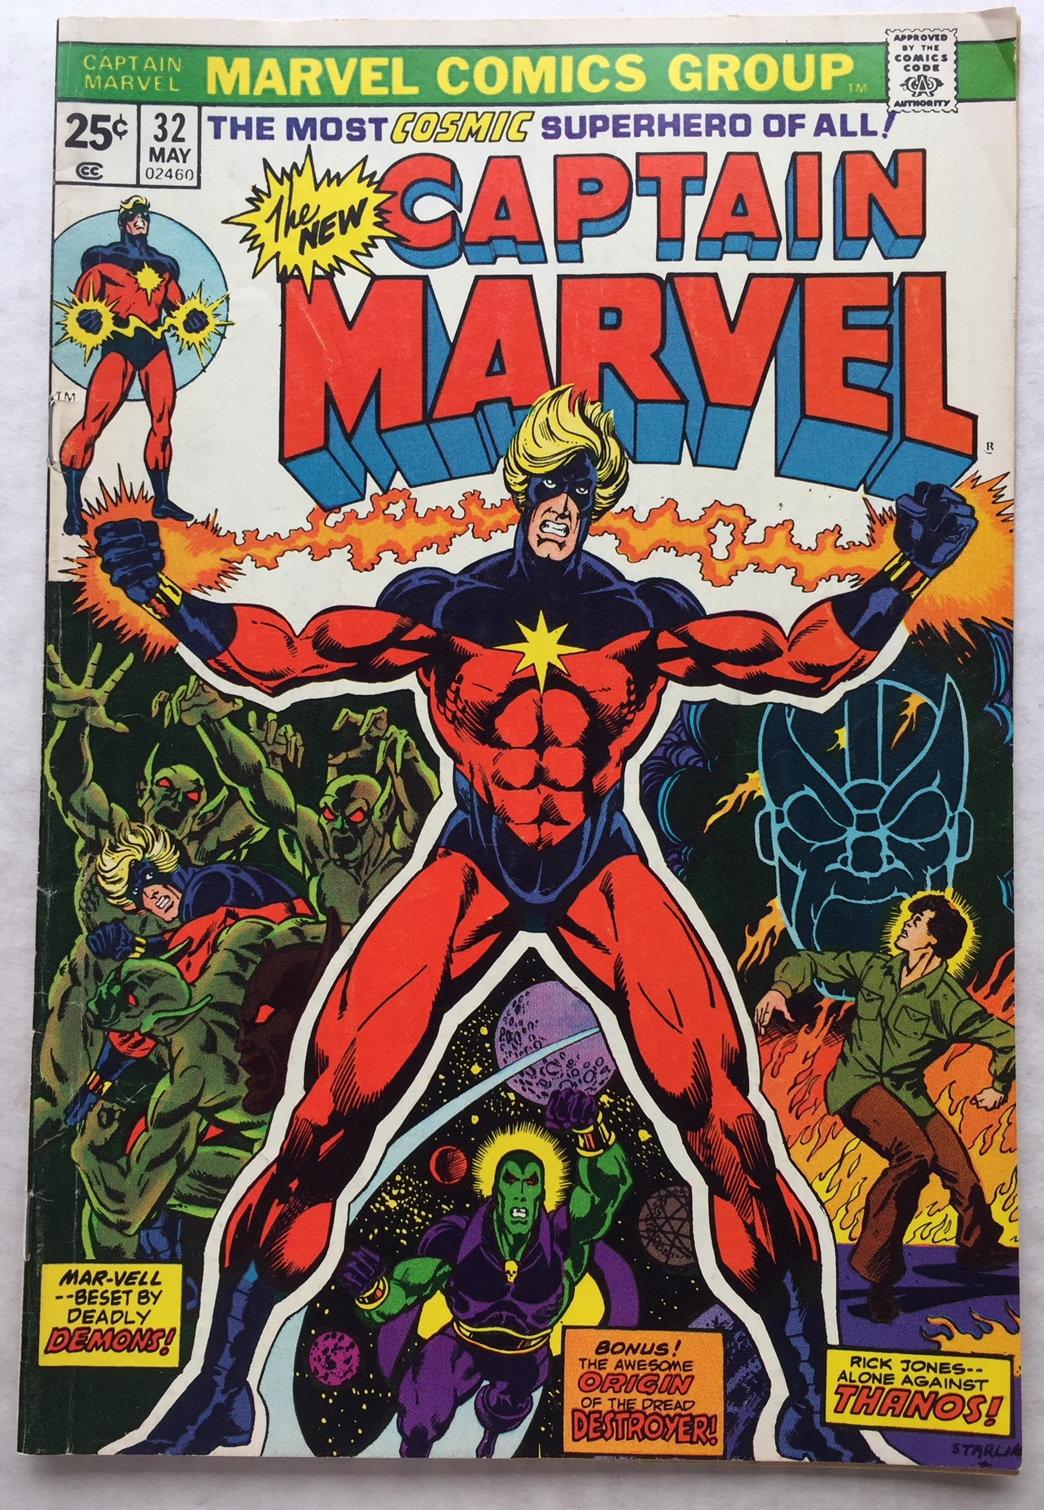 20 CAPTAIN MARVEL 20 comic book Drax the Destroyer Moondragon origins  Thanos Jim Starlin